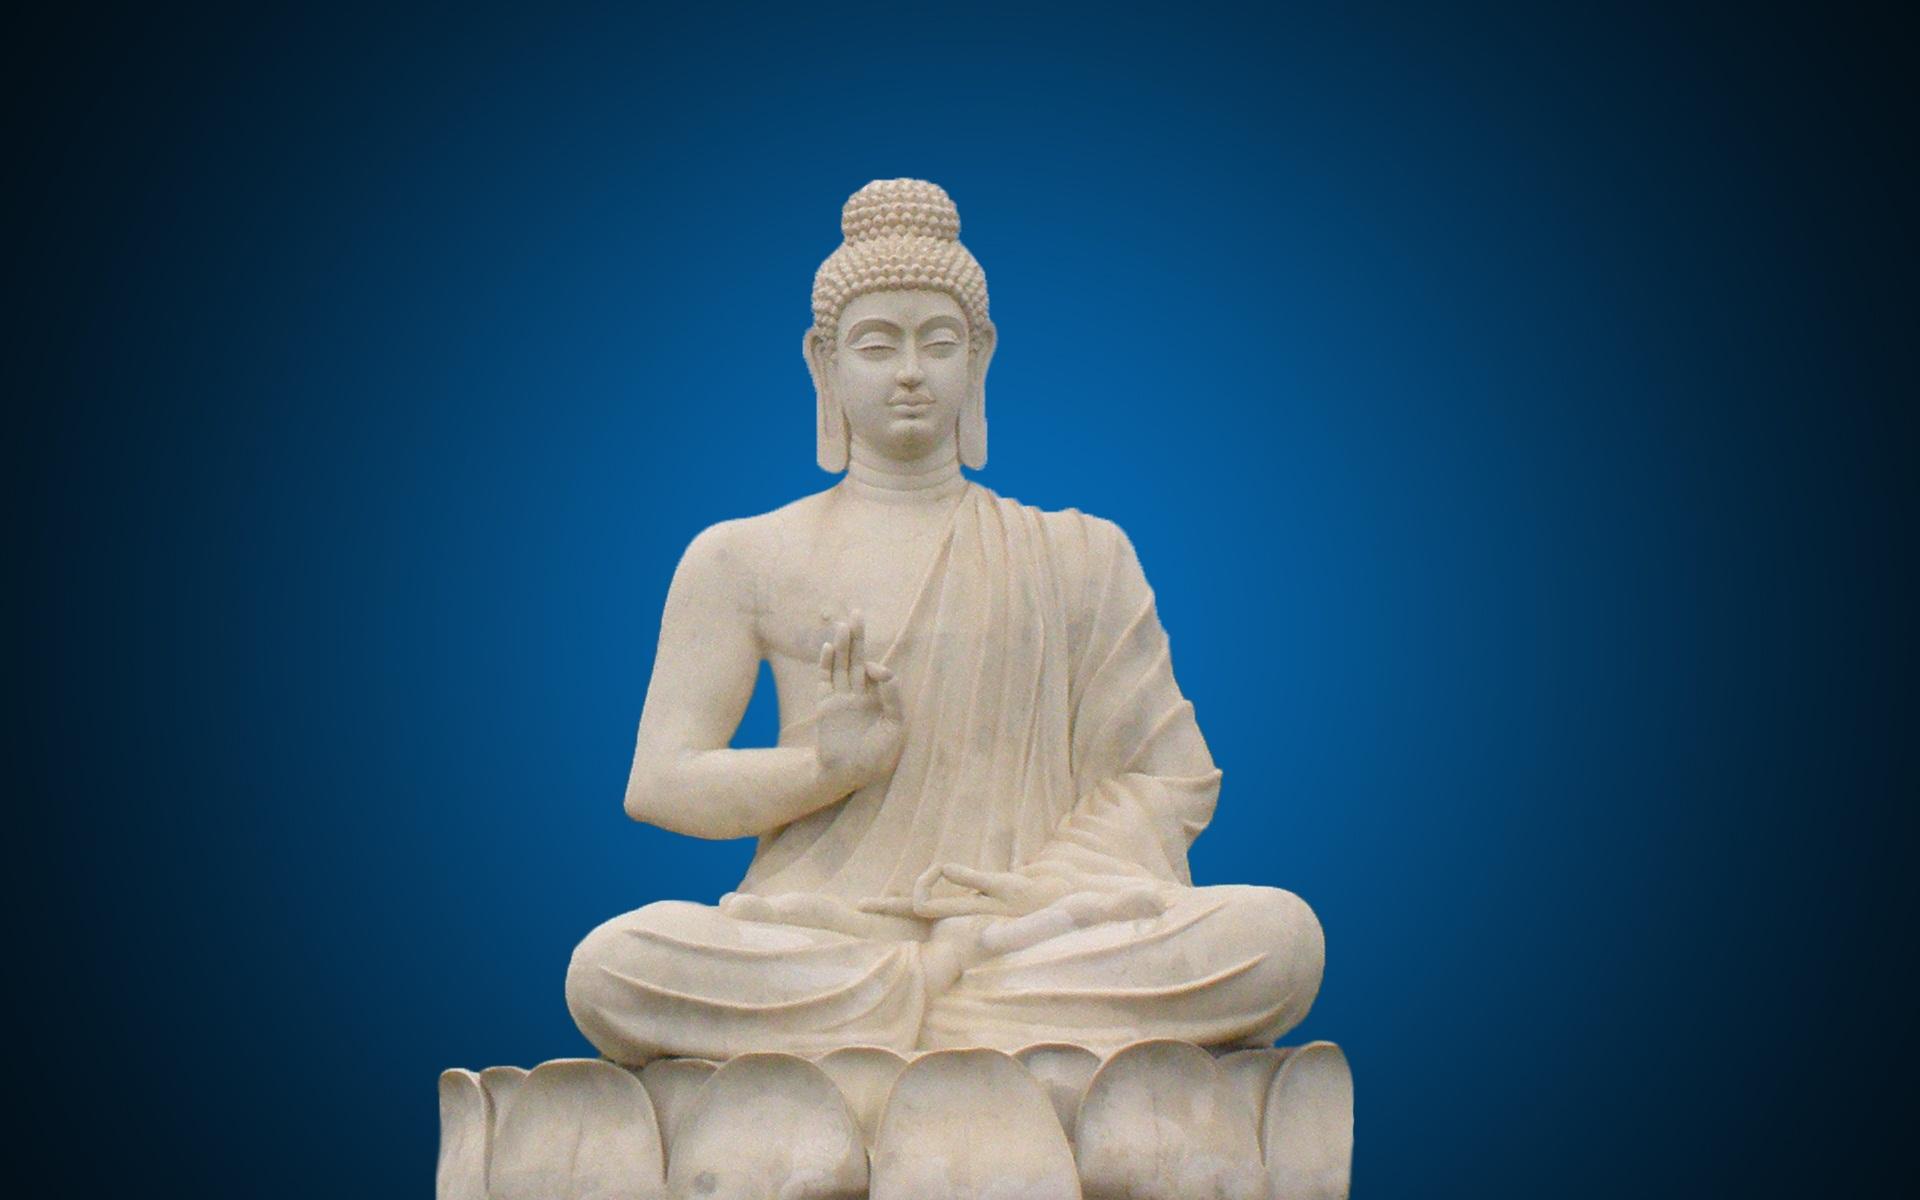 lord buddha tv live - HD1920×1200